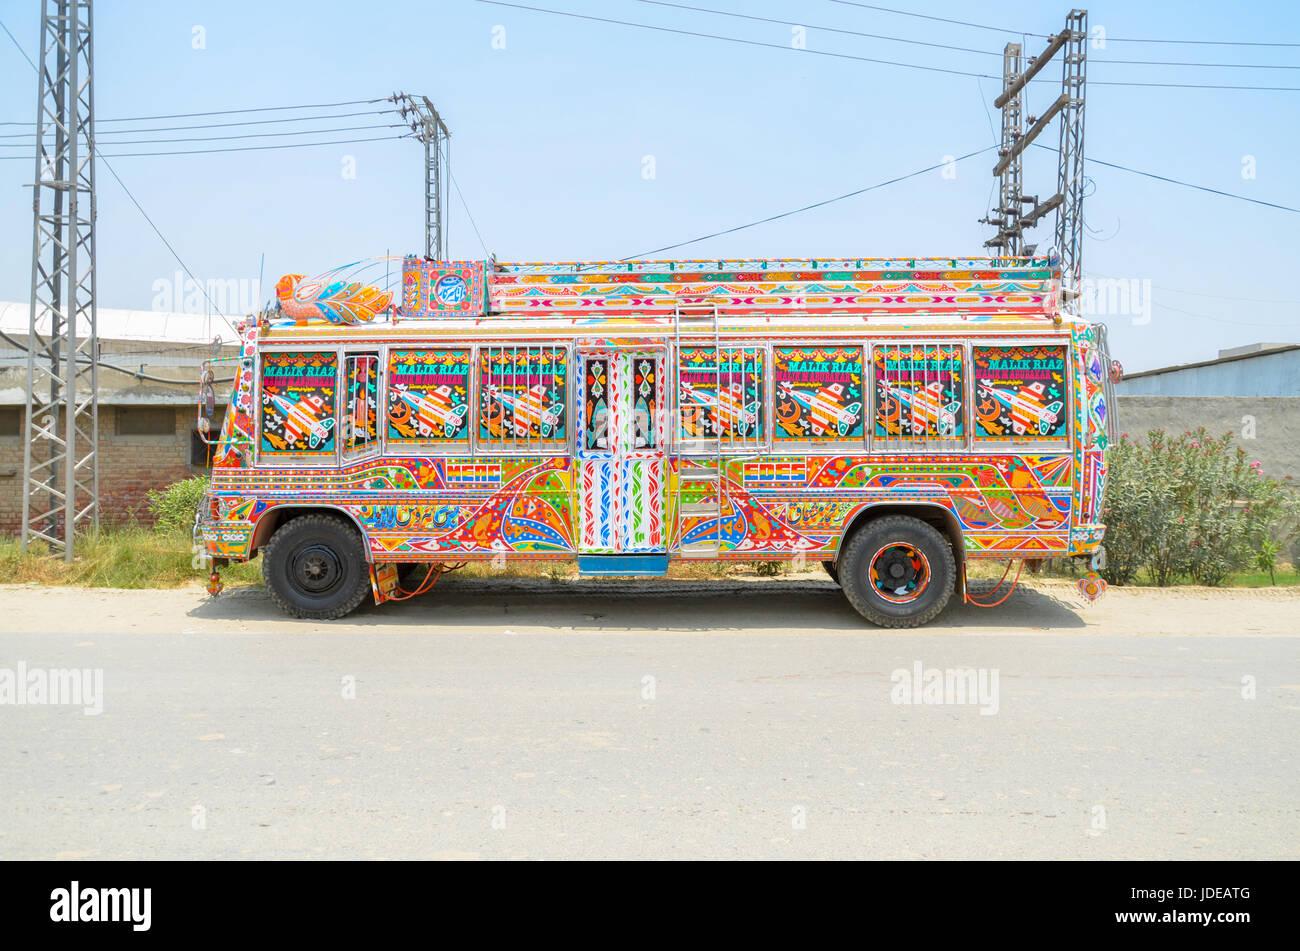 Decorated Traditional Pakistani Bus - Stock Image